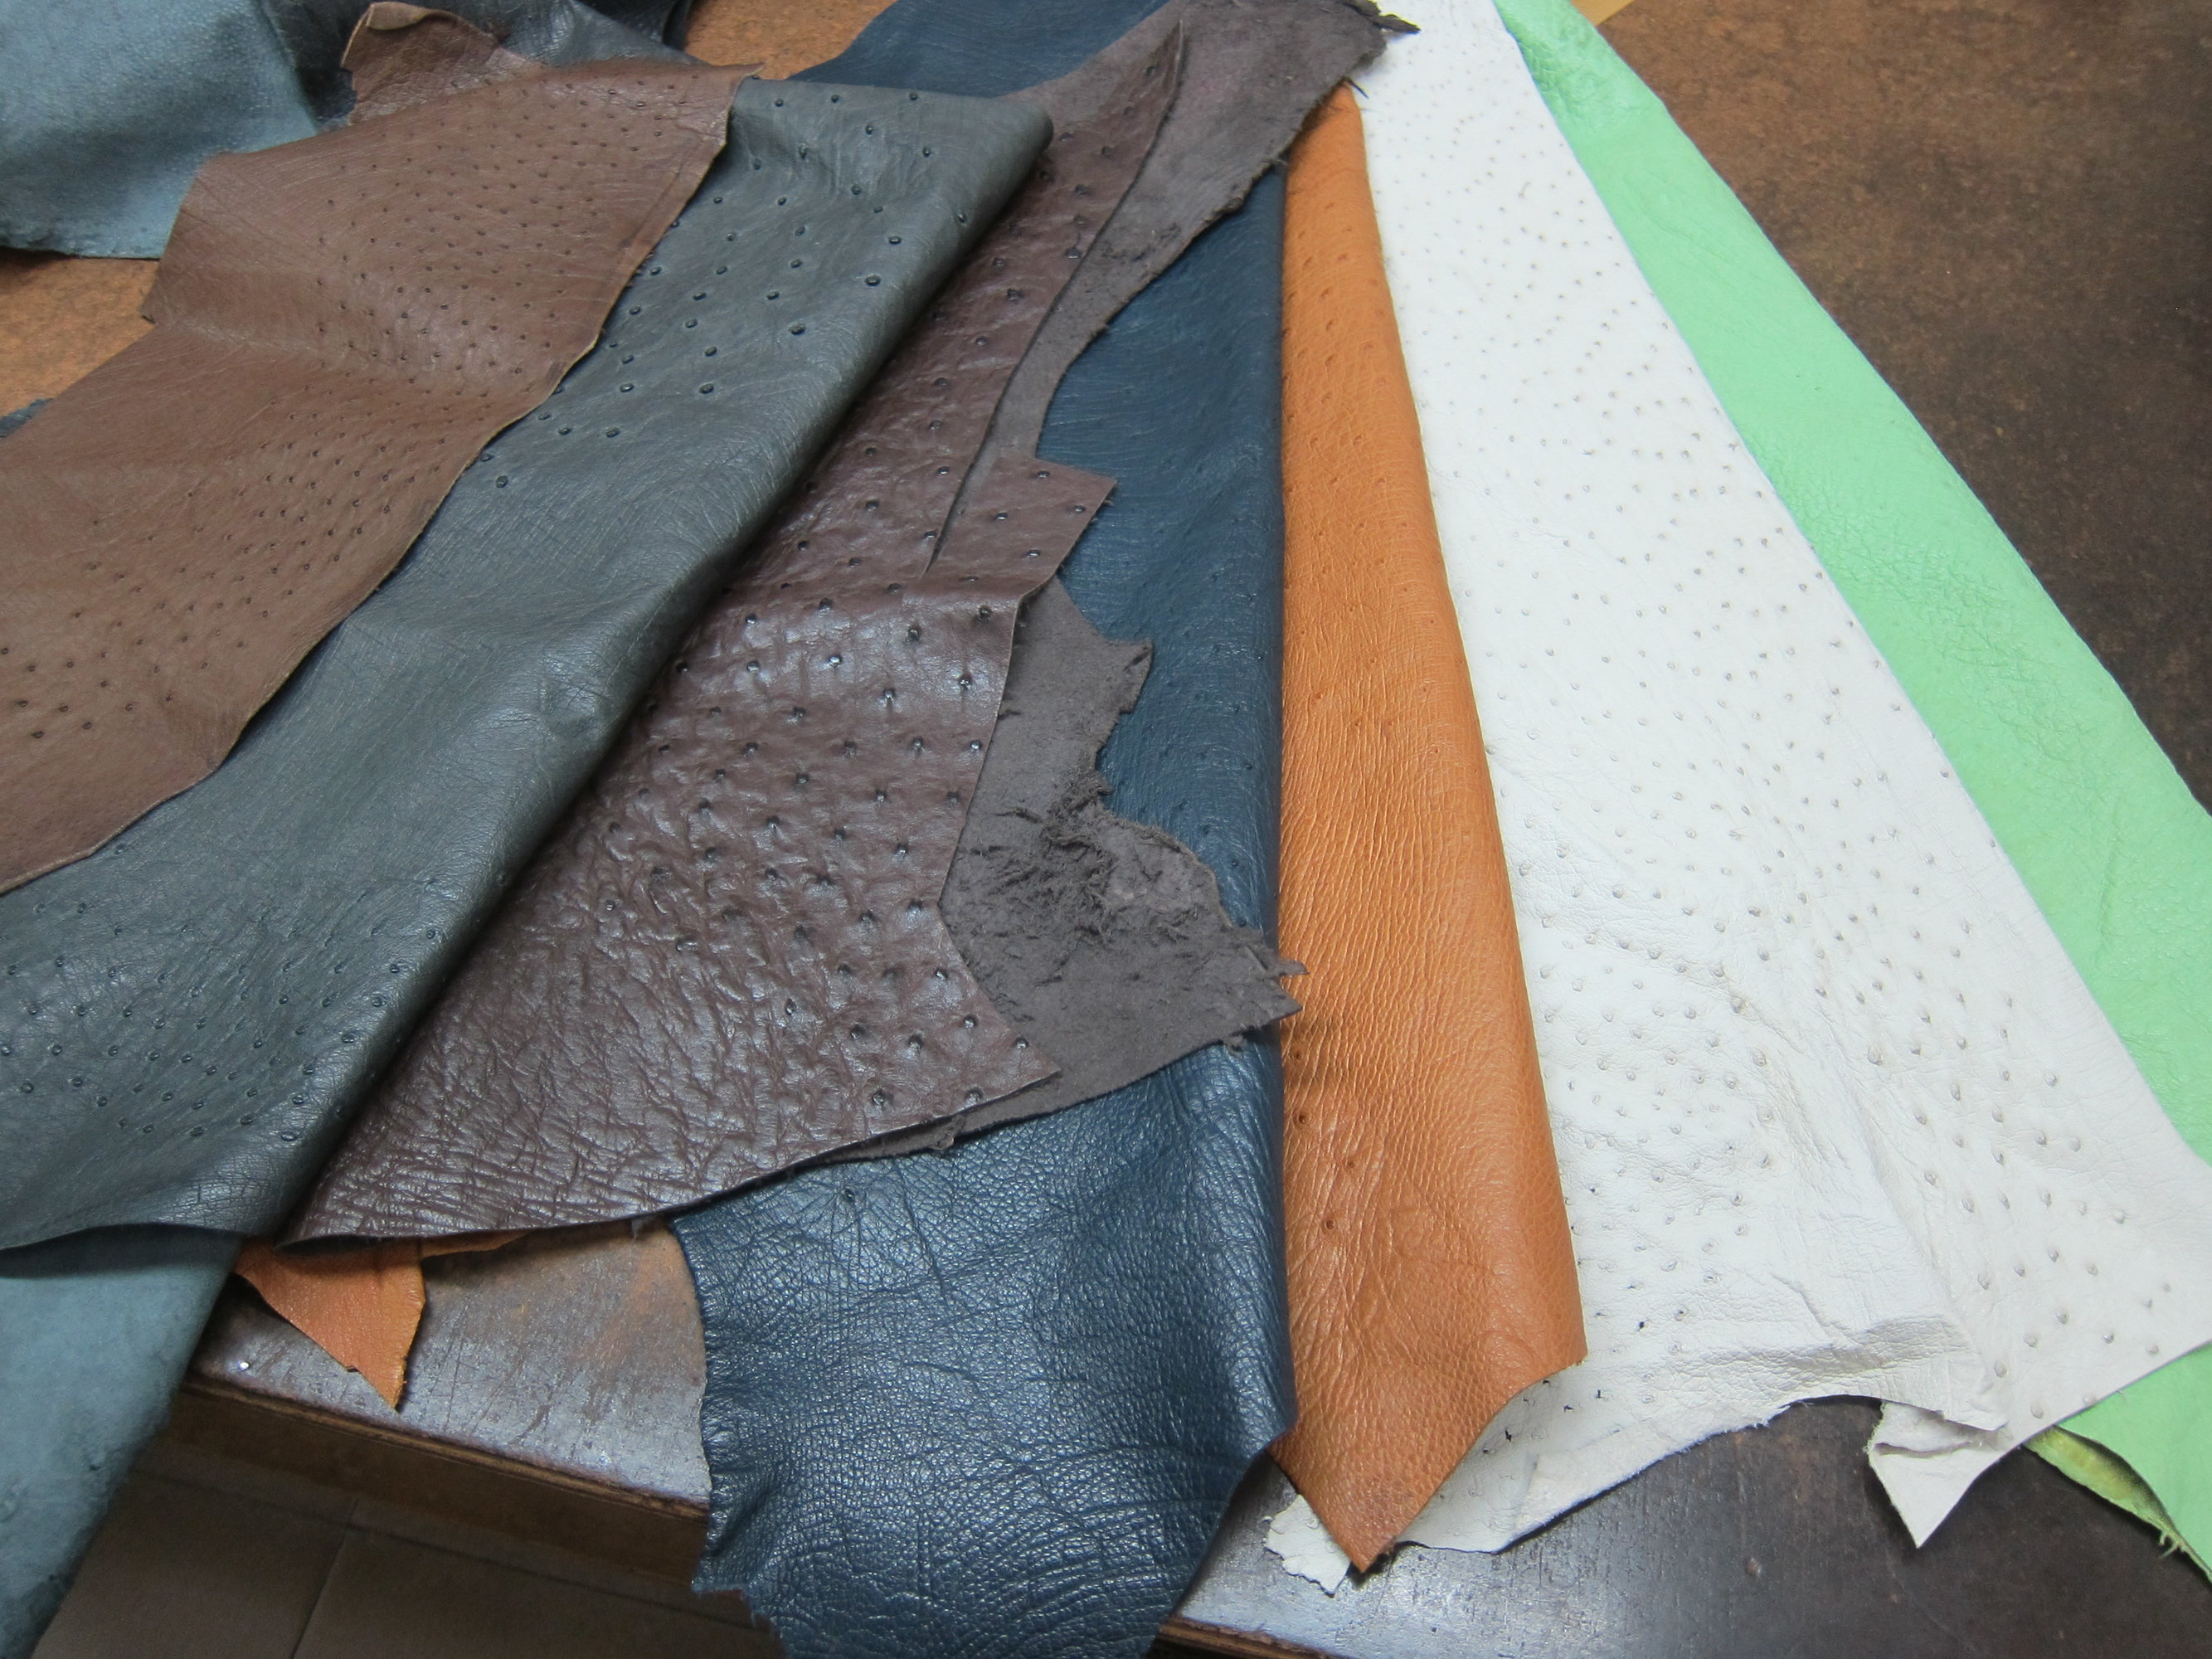 ostrich leather 鴕鳥皮.JPG